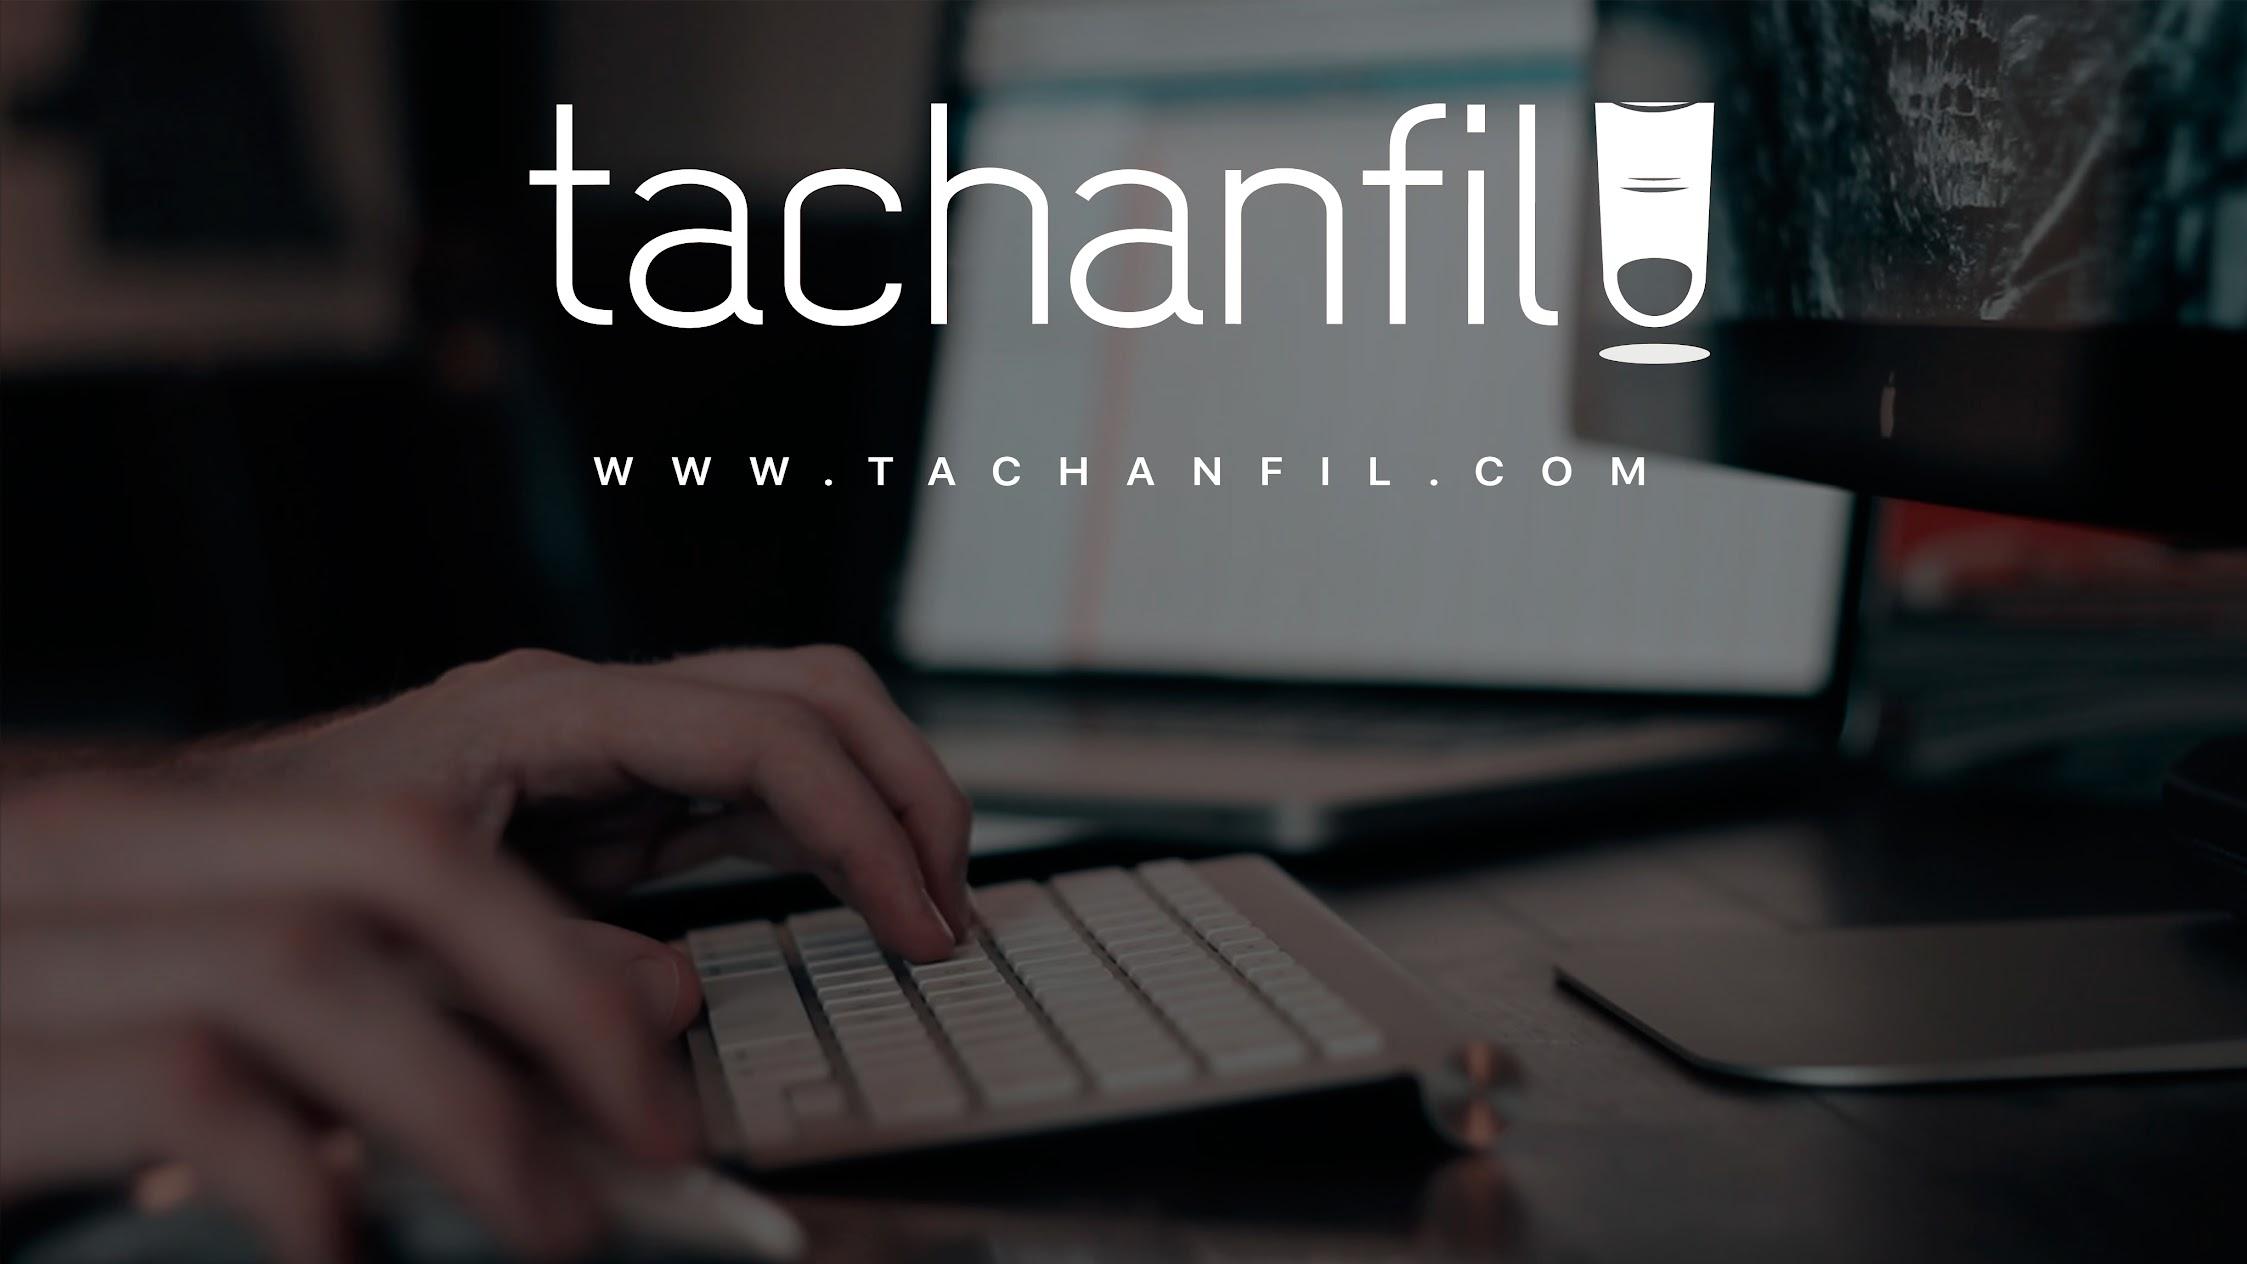 TACHANFIL